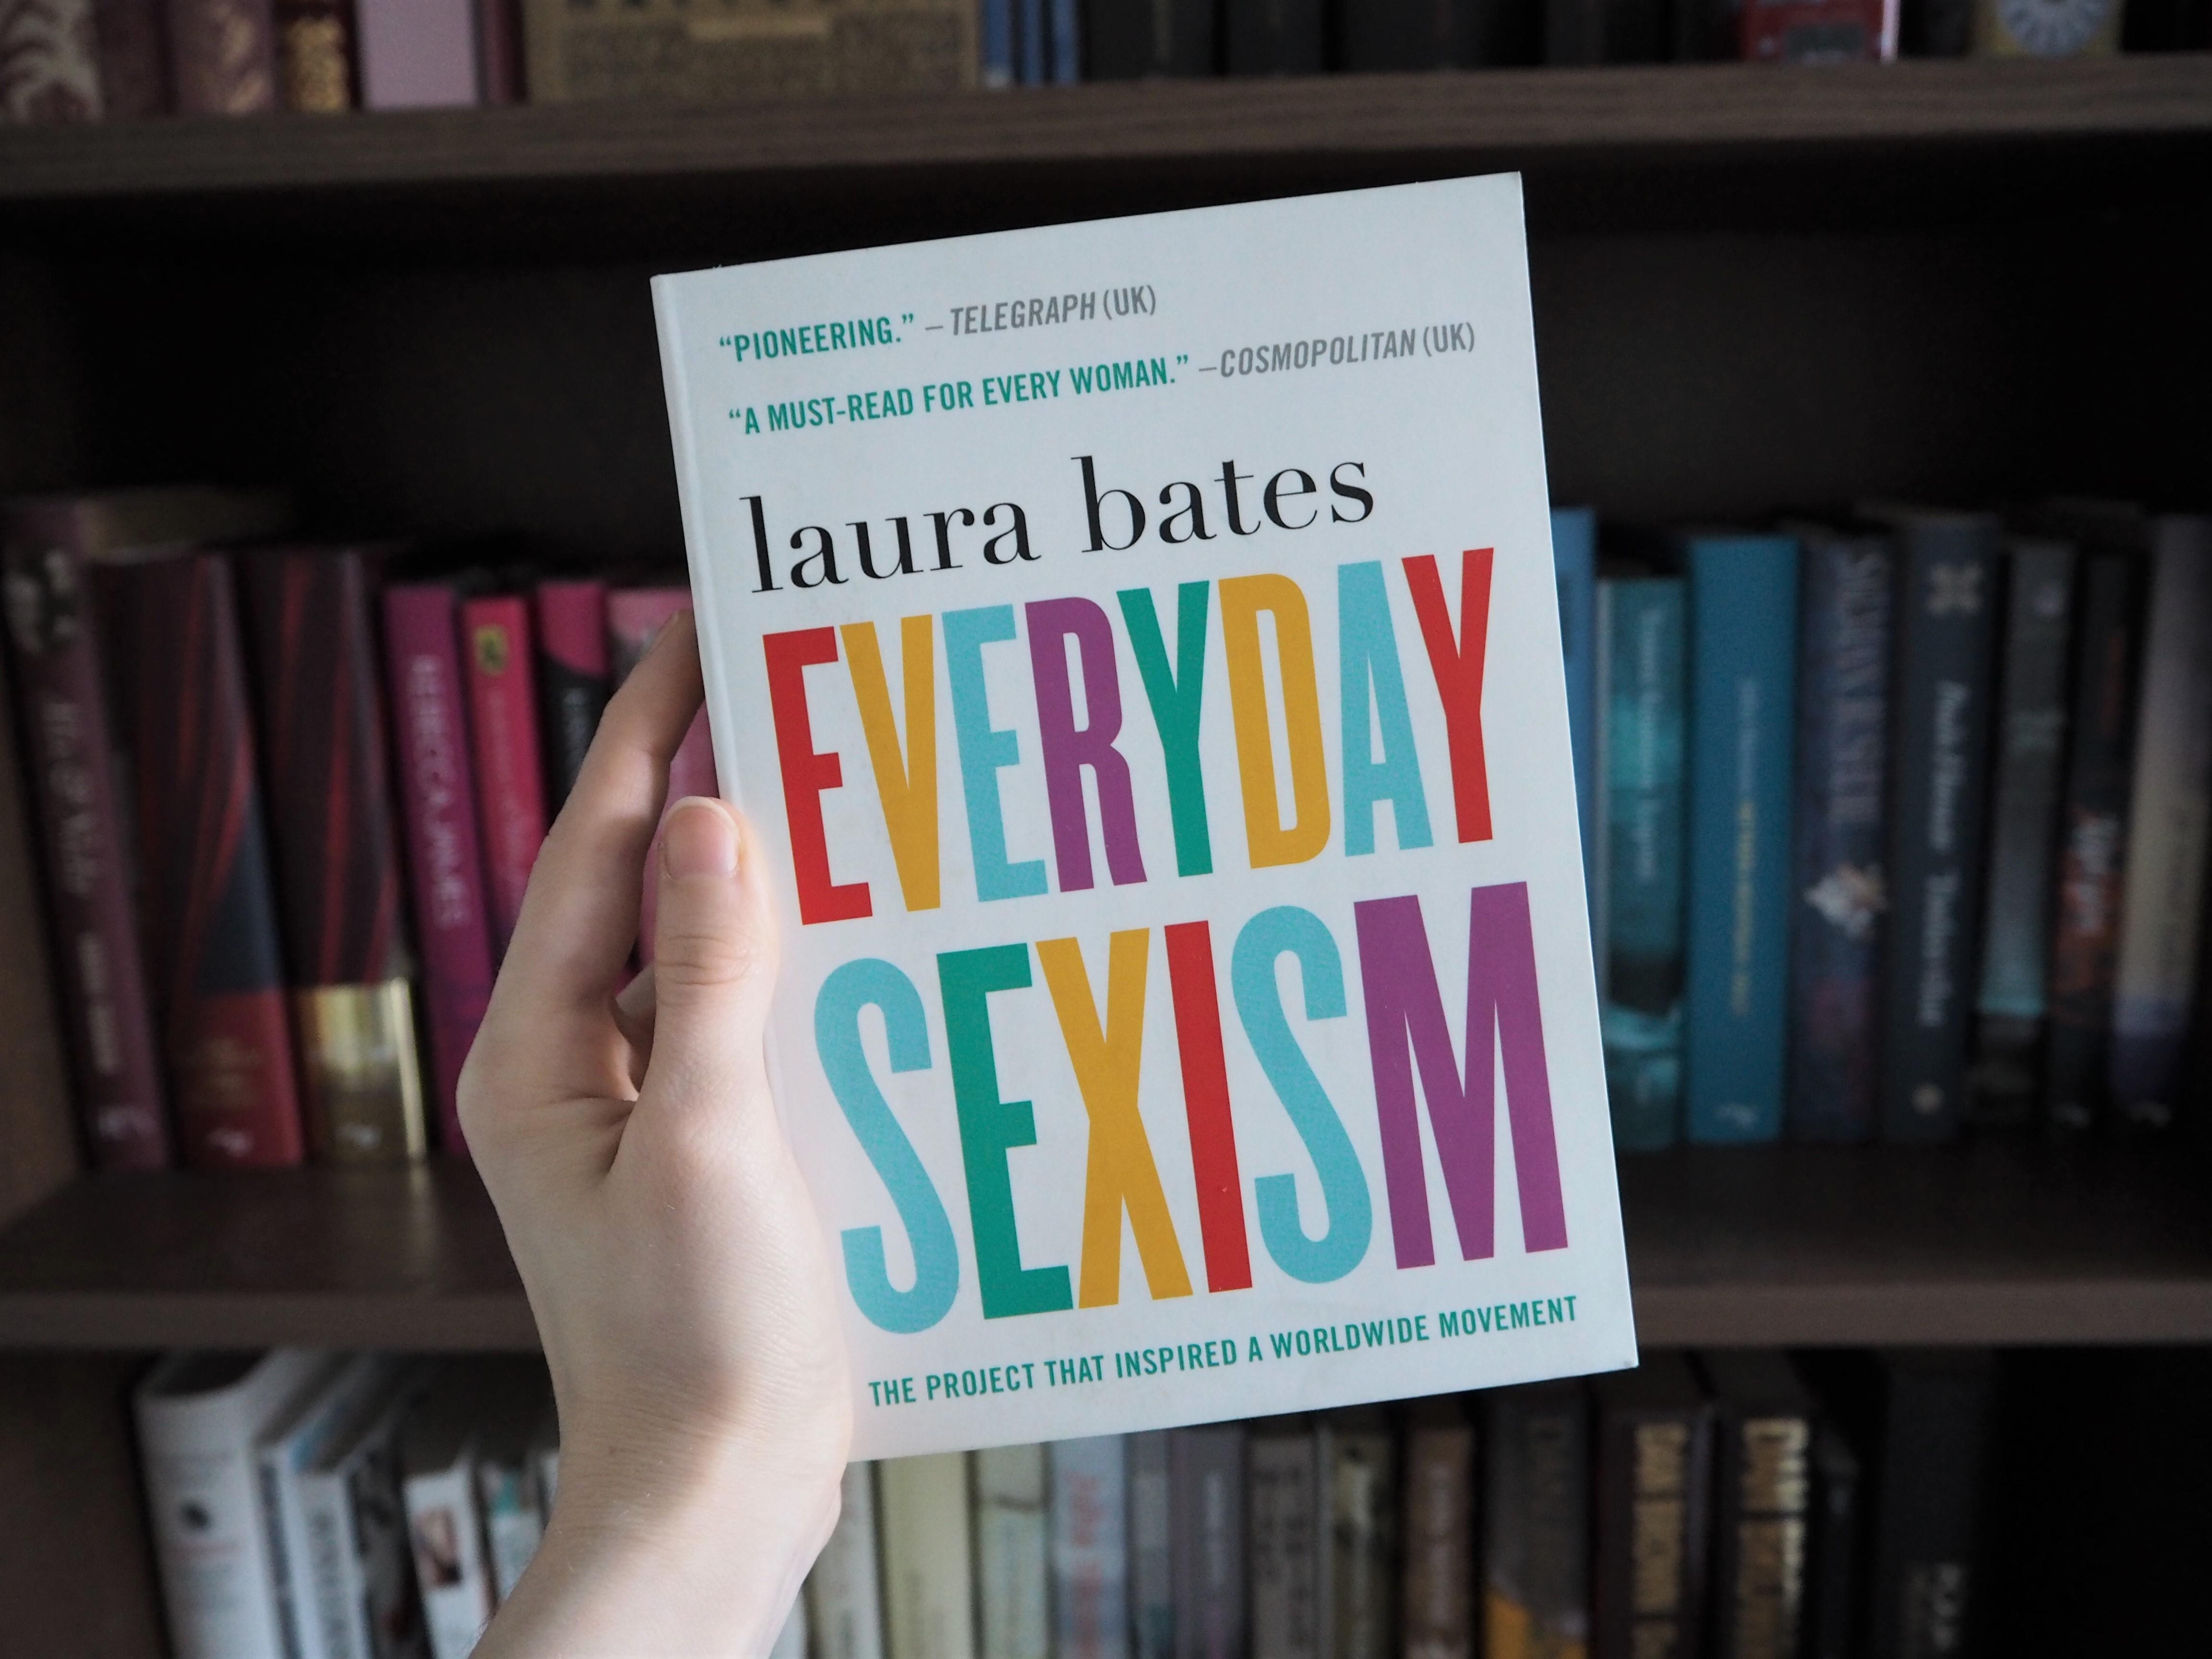 laura bates everyday sexism suomi blogi arvostelu